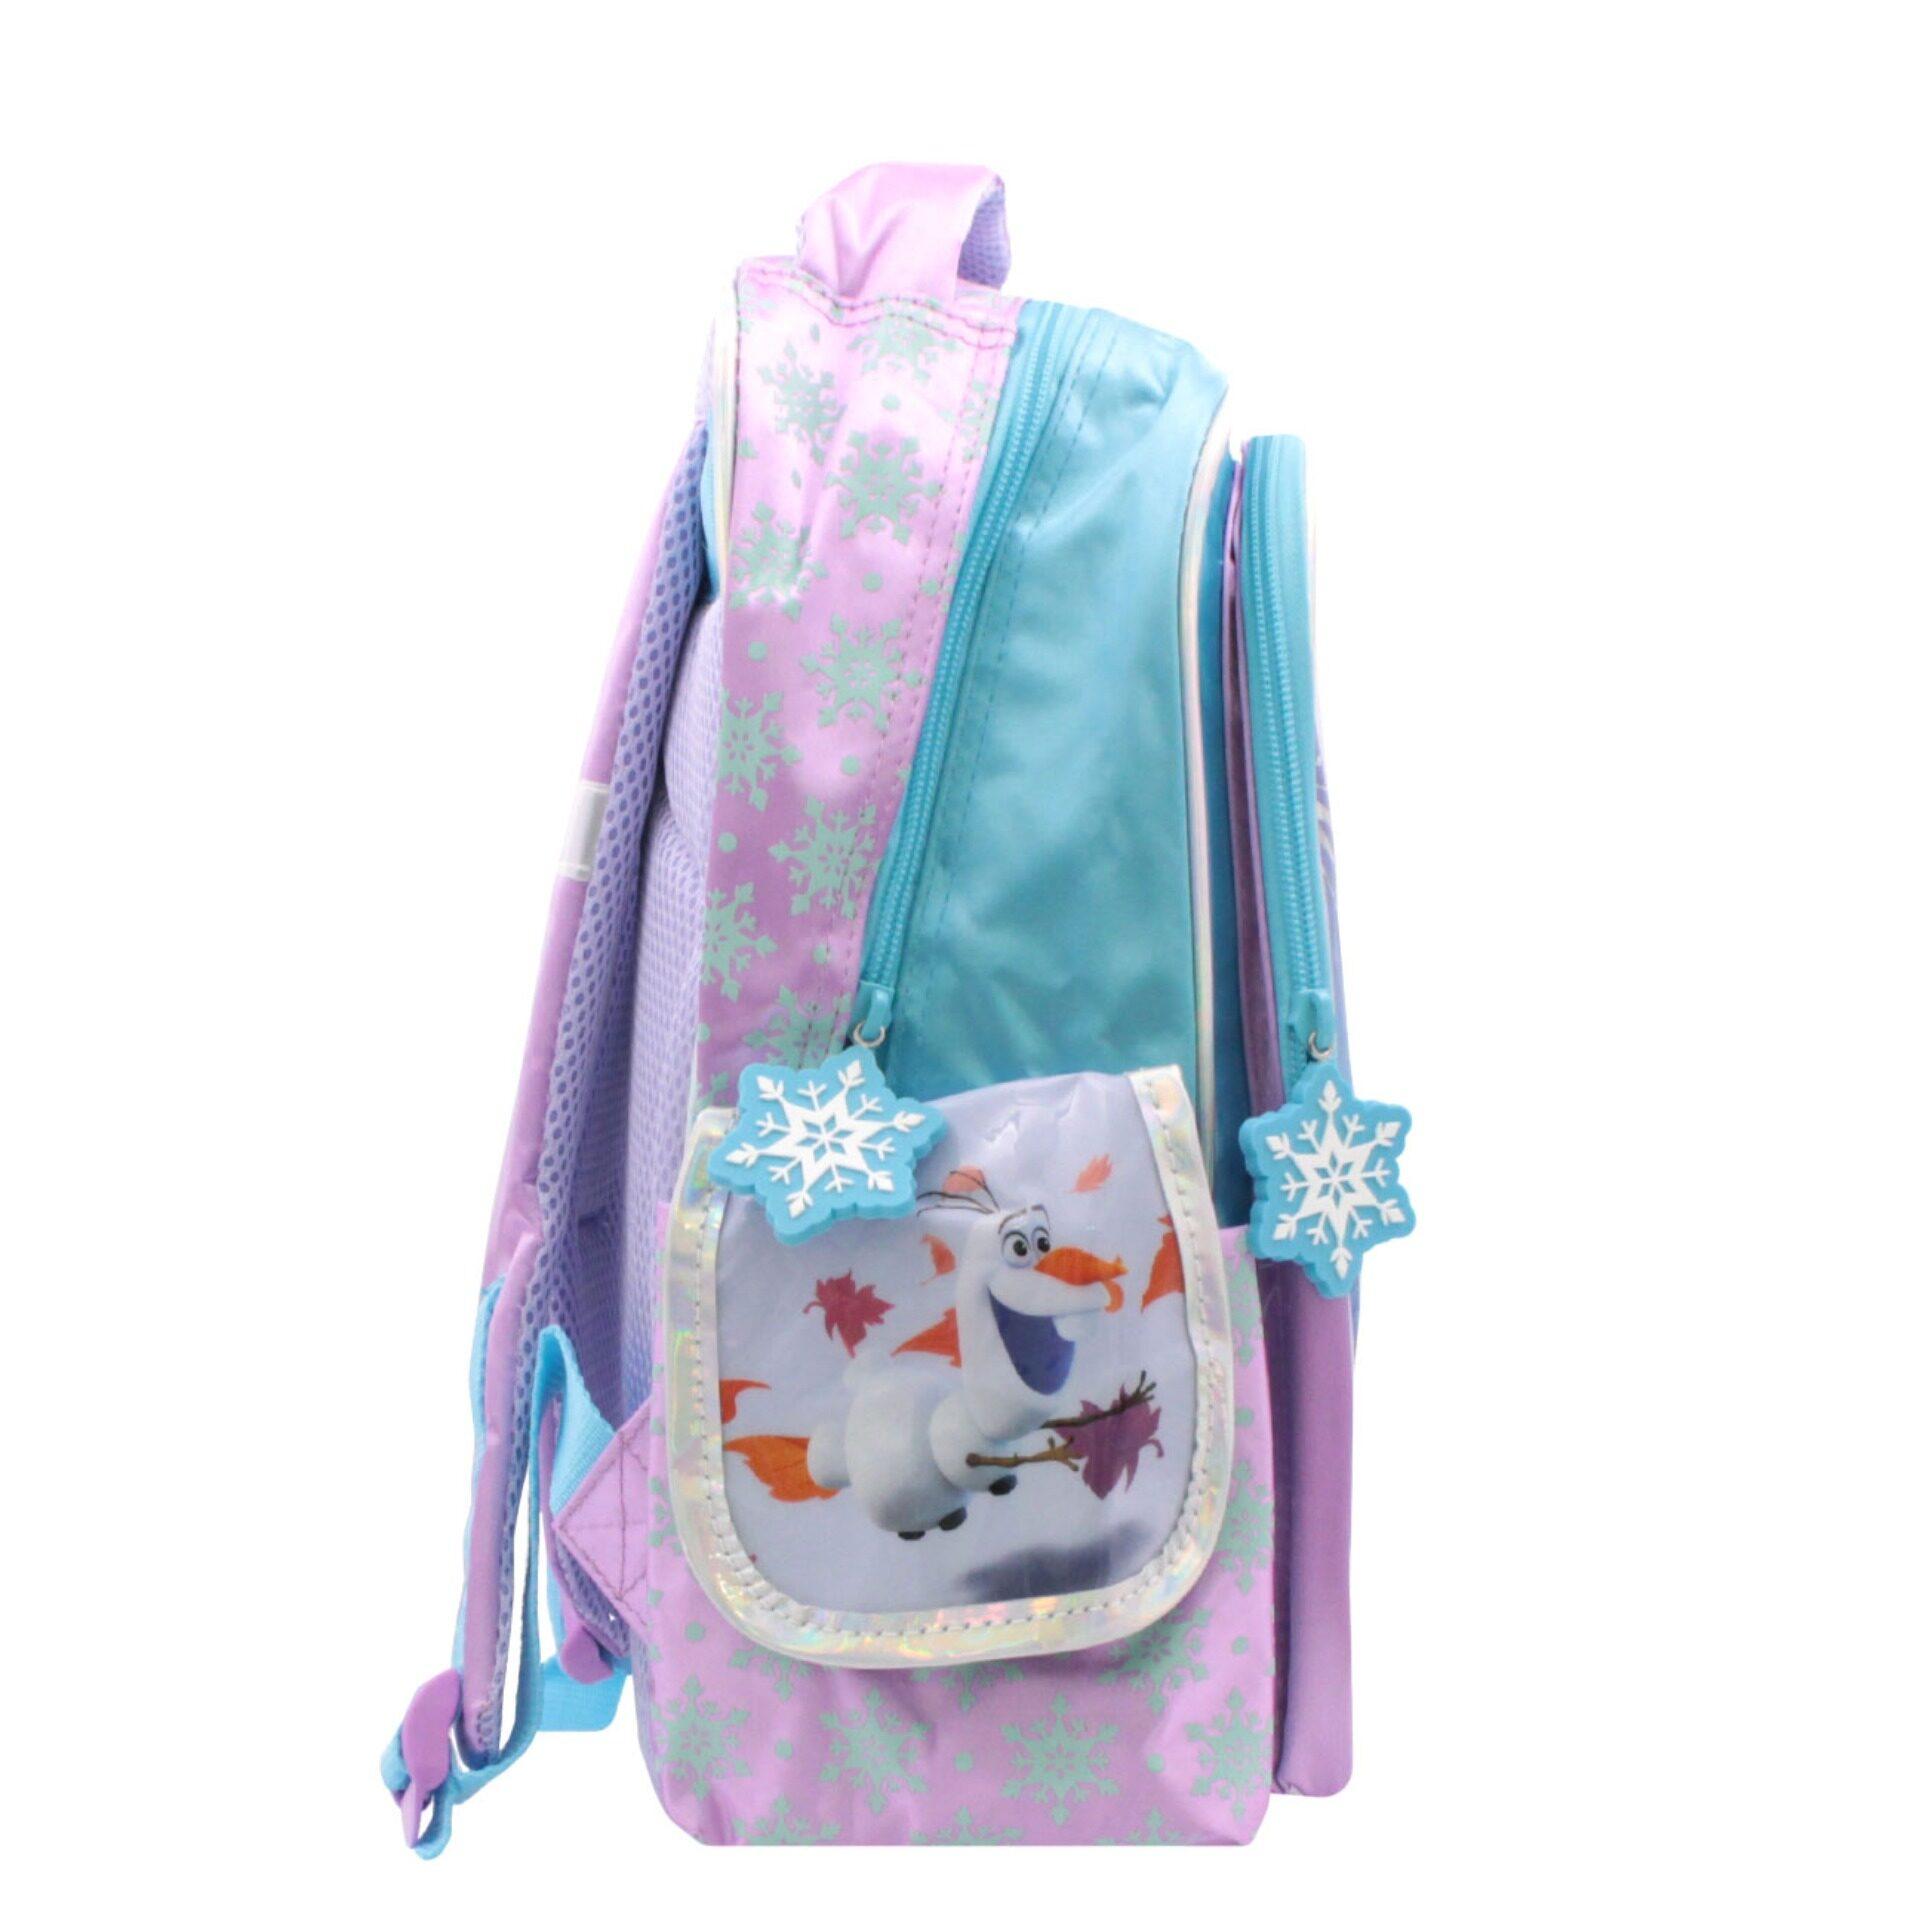 Disney Frozen 2 Princess Elsa Anna & Olaf Pre School Bag (Light Purple & Blue) (Age 4 & Above)